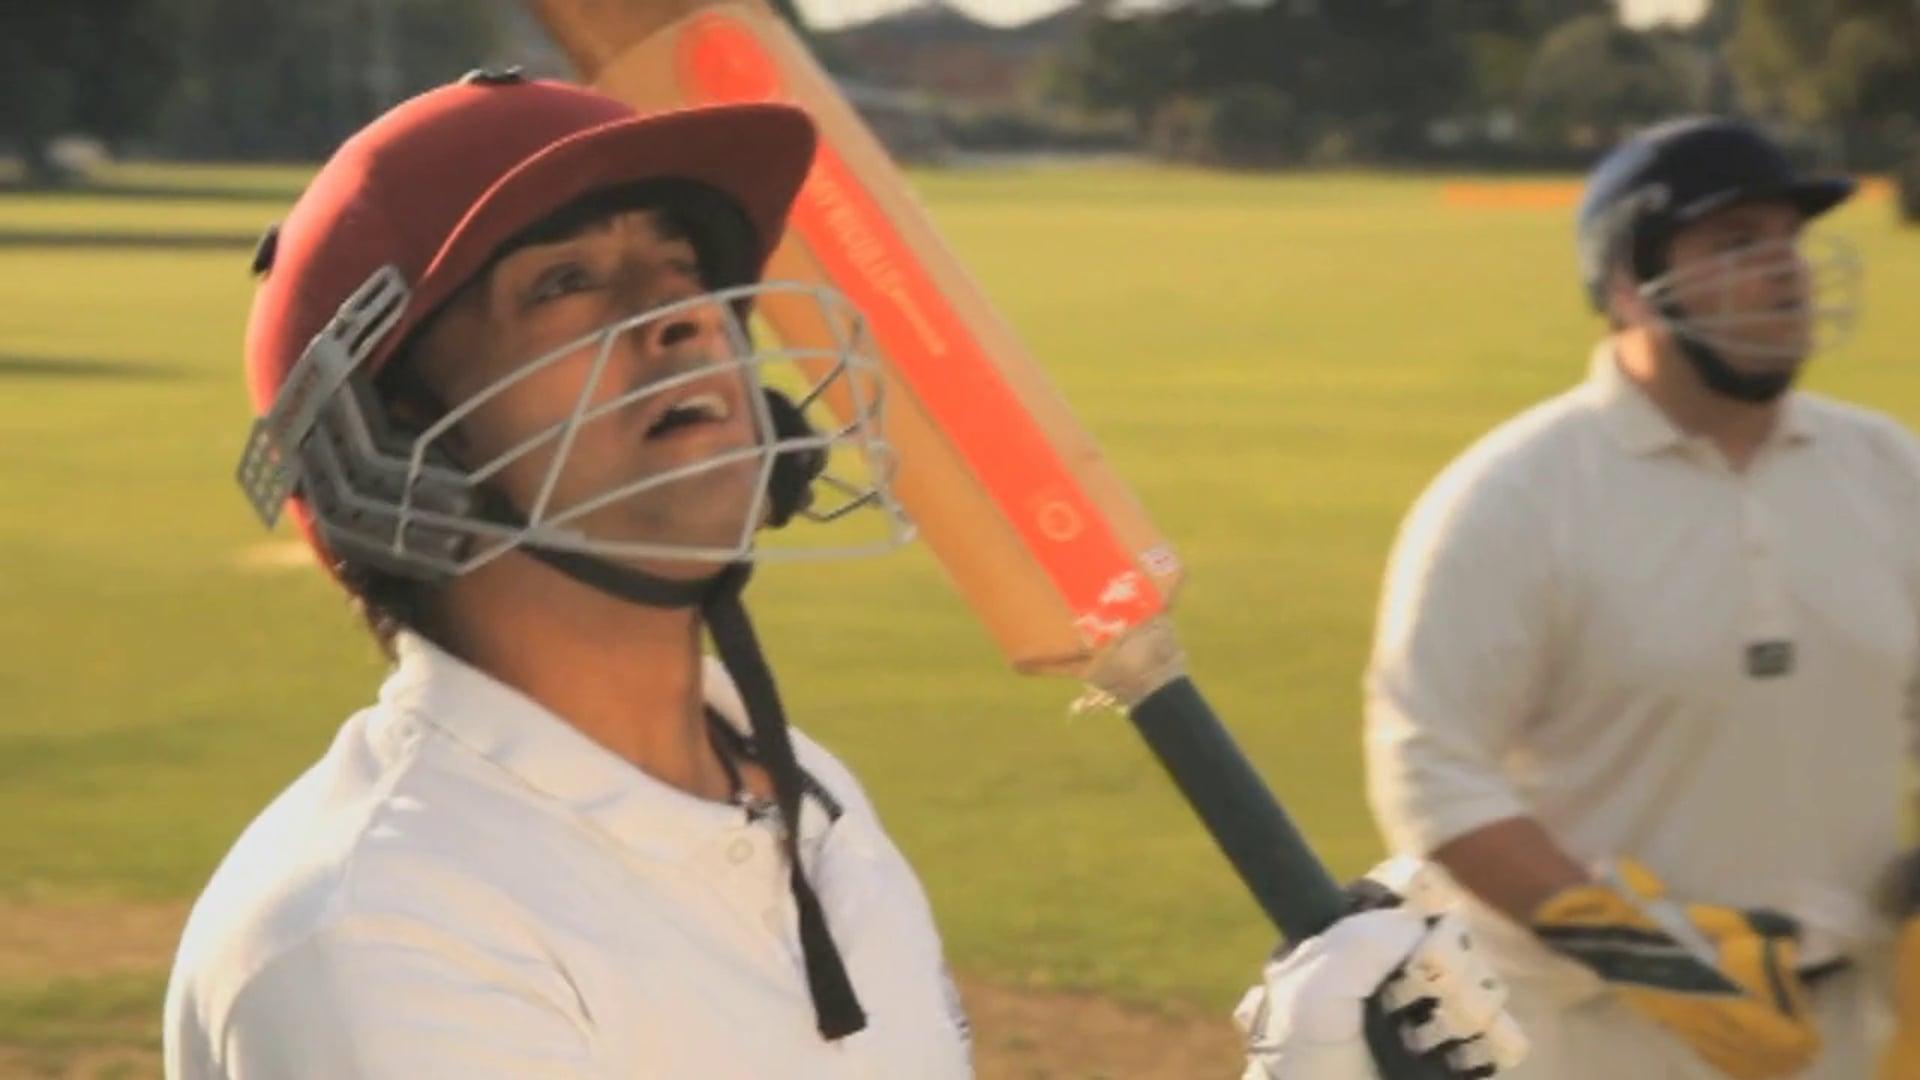 Autoglass Bumpers 'Cricket'